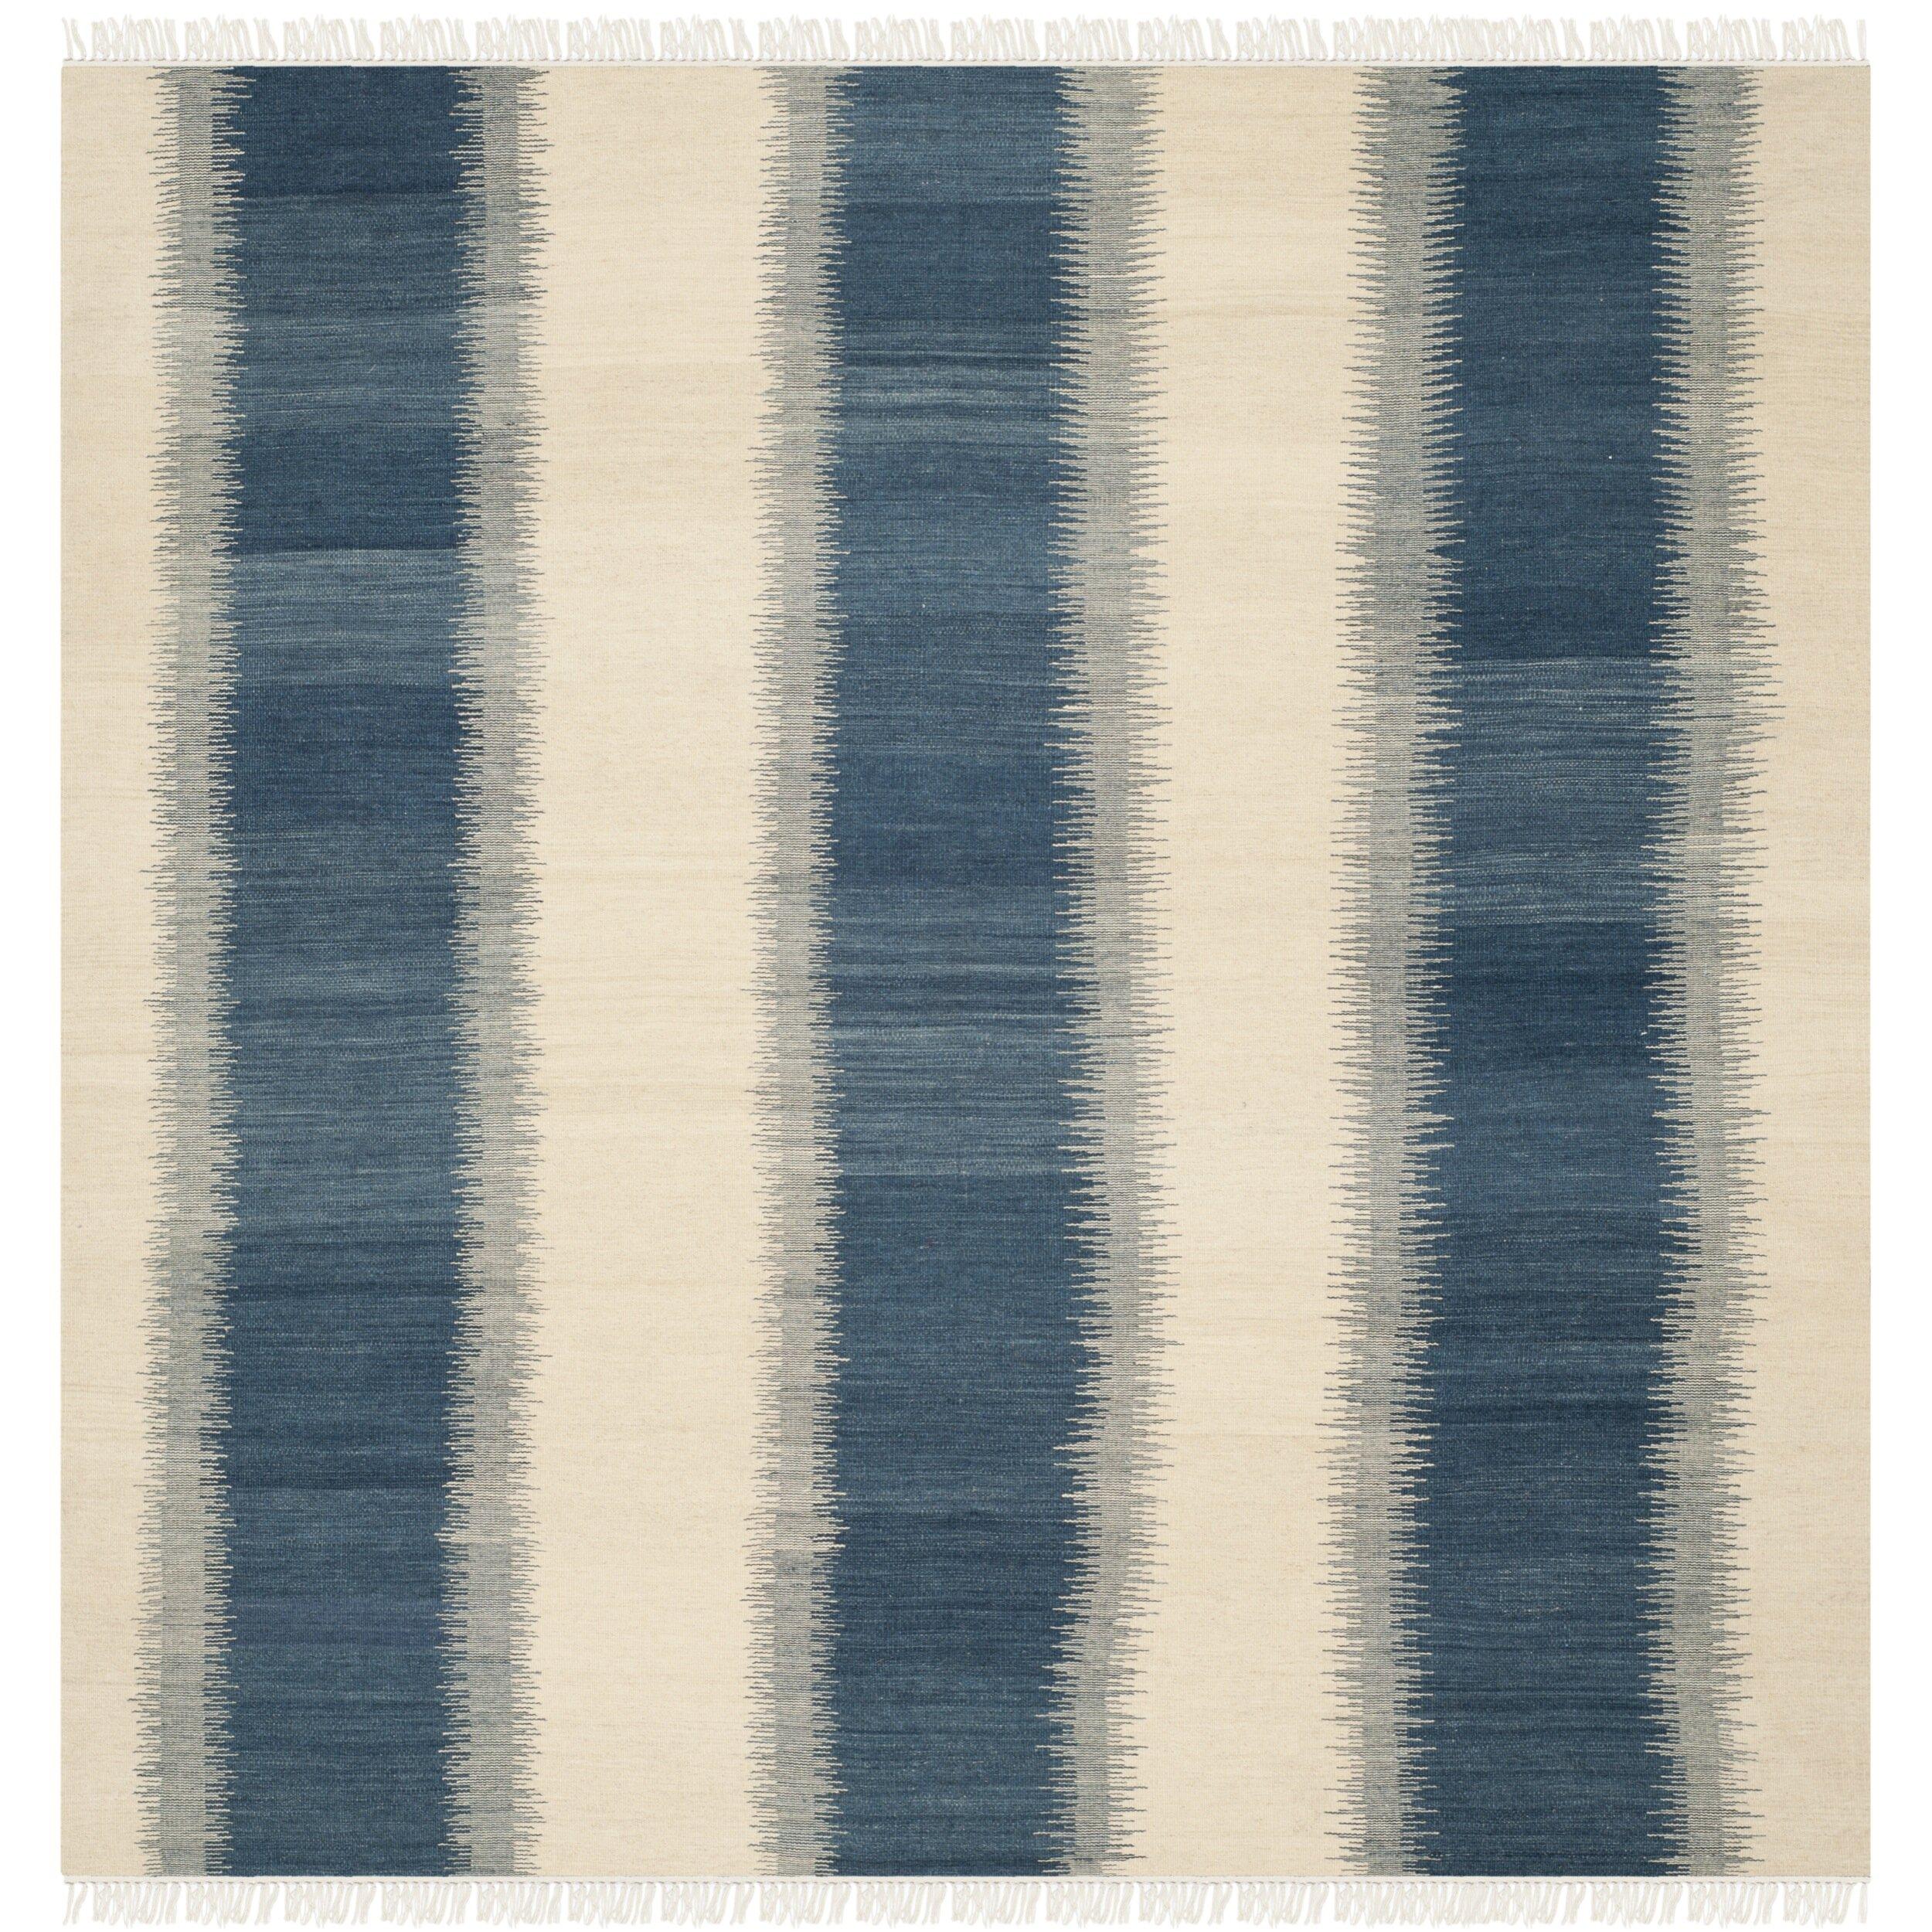 Safavieh Navajo Kilim Blue & Ivory Area Rug & Reviews